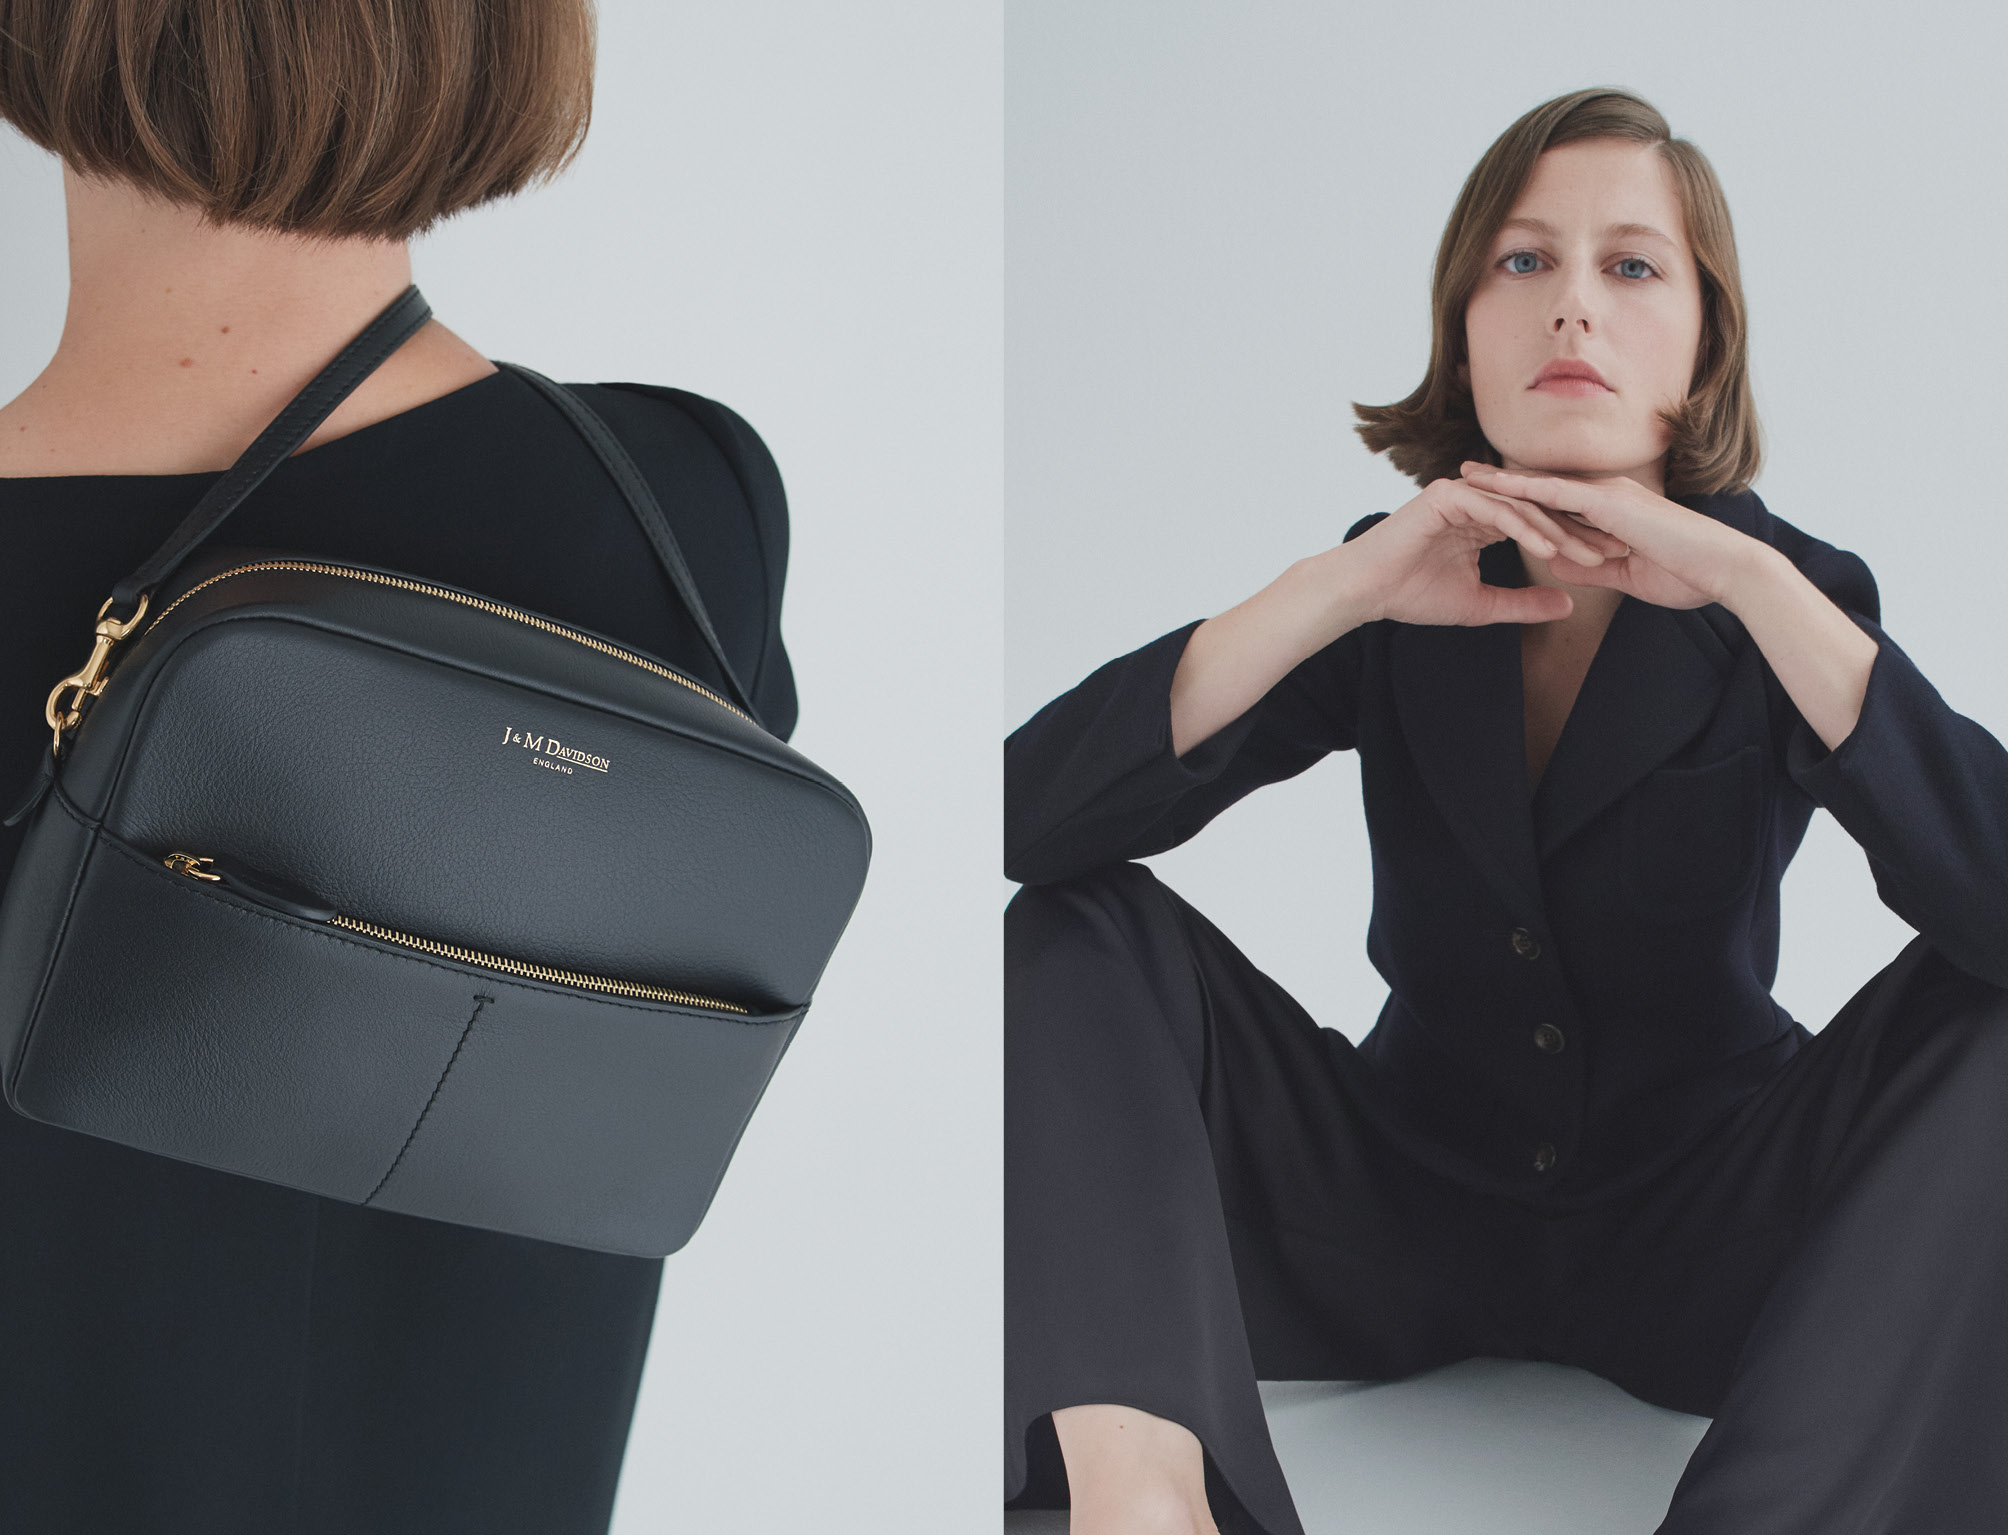 Photographer: Andrea Spotorno  Stylist: Lyson Marchessault  Model: Gwenola Guichard